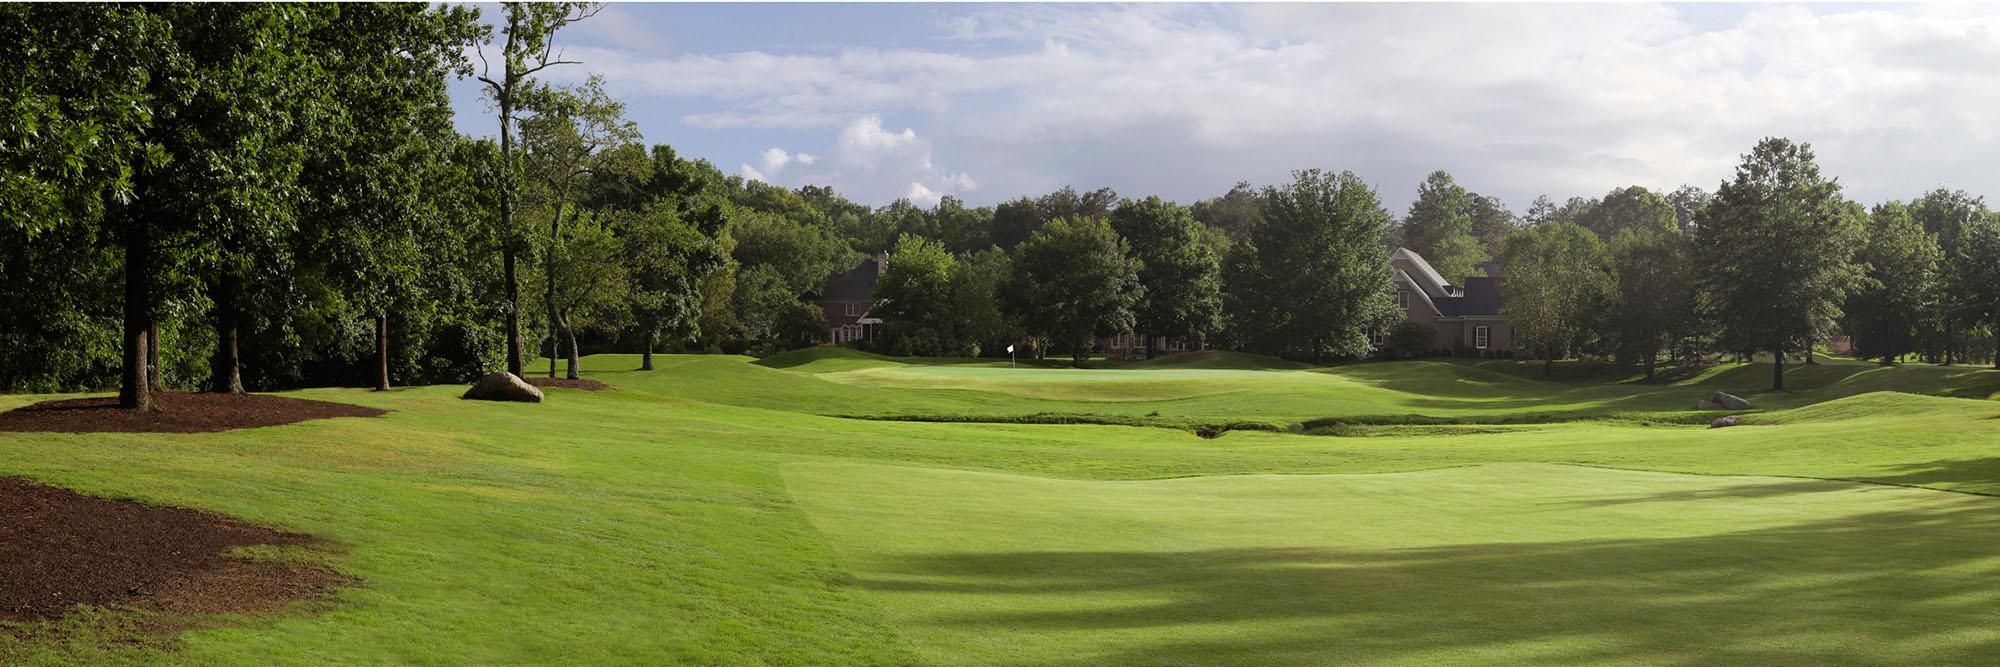 Golf Course Image - River Run Country Club No. 7